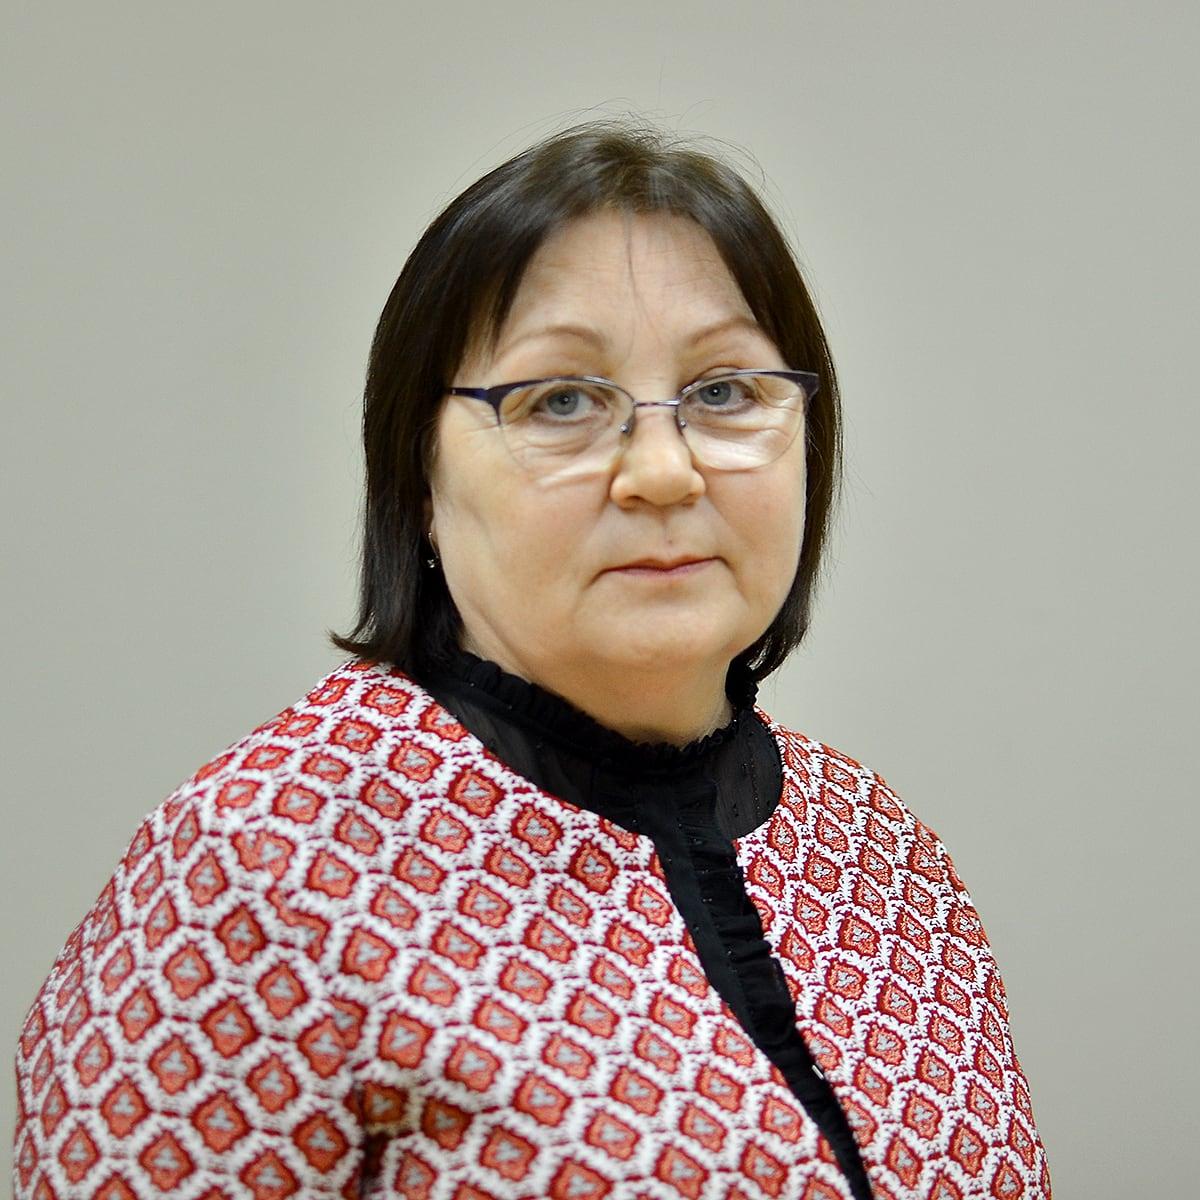 Параева Людмила Афанасьевна